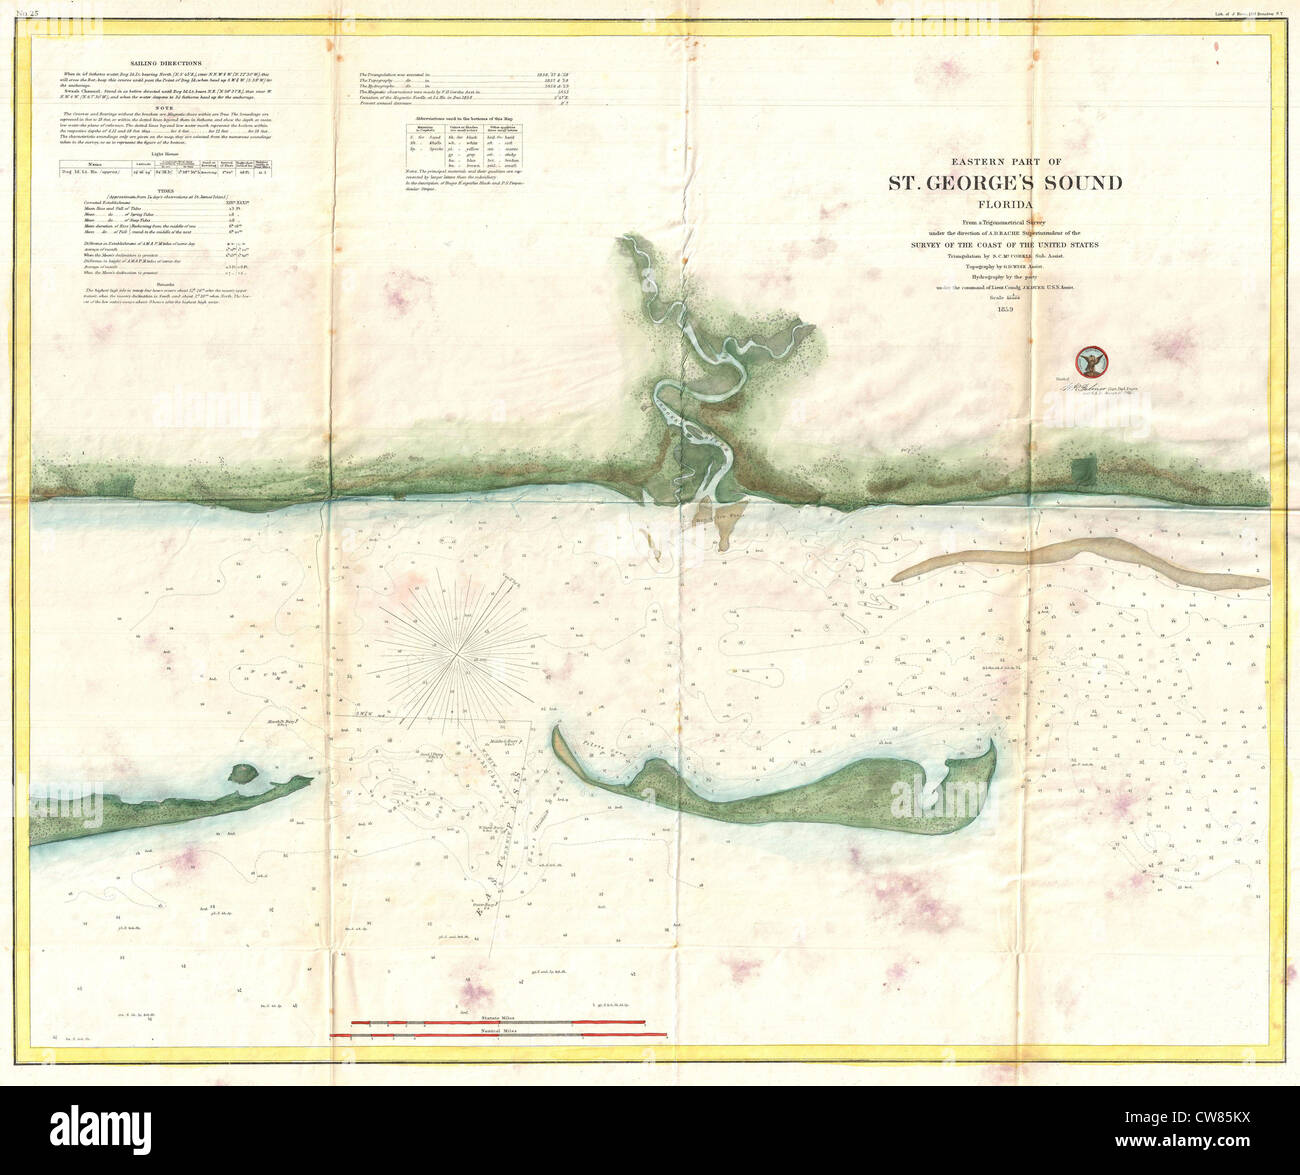 Saint George Florida Map.1859 U S Coast Survey Map Of St George Sound Florida Panhandle